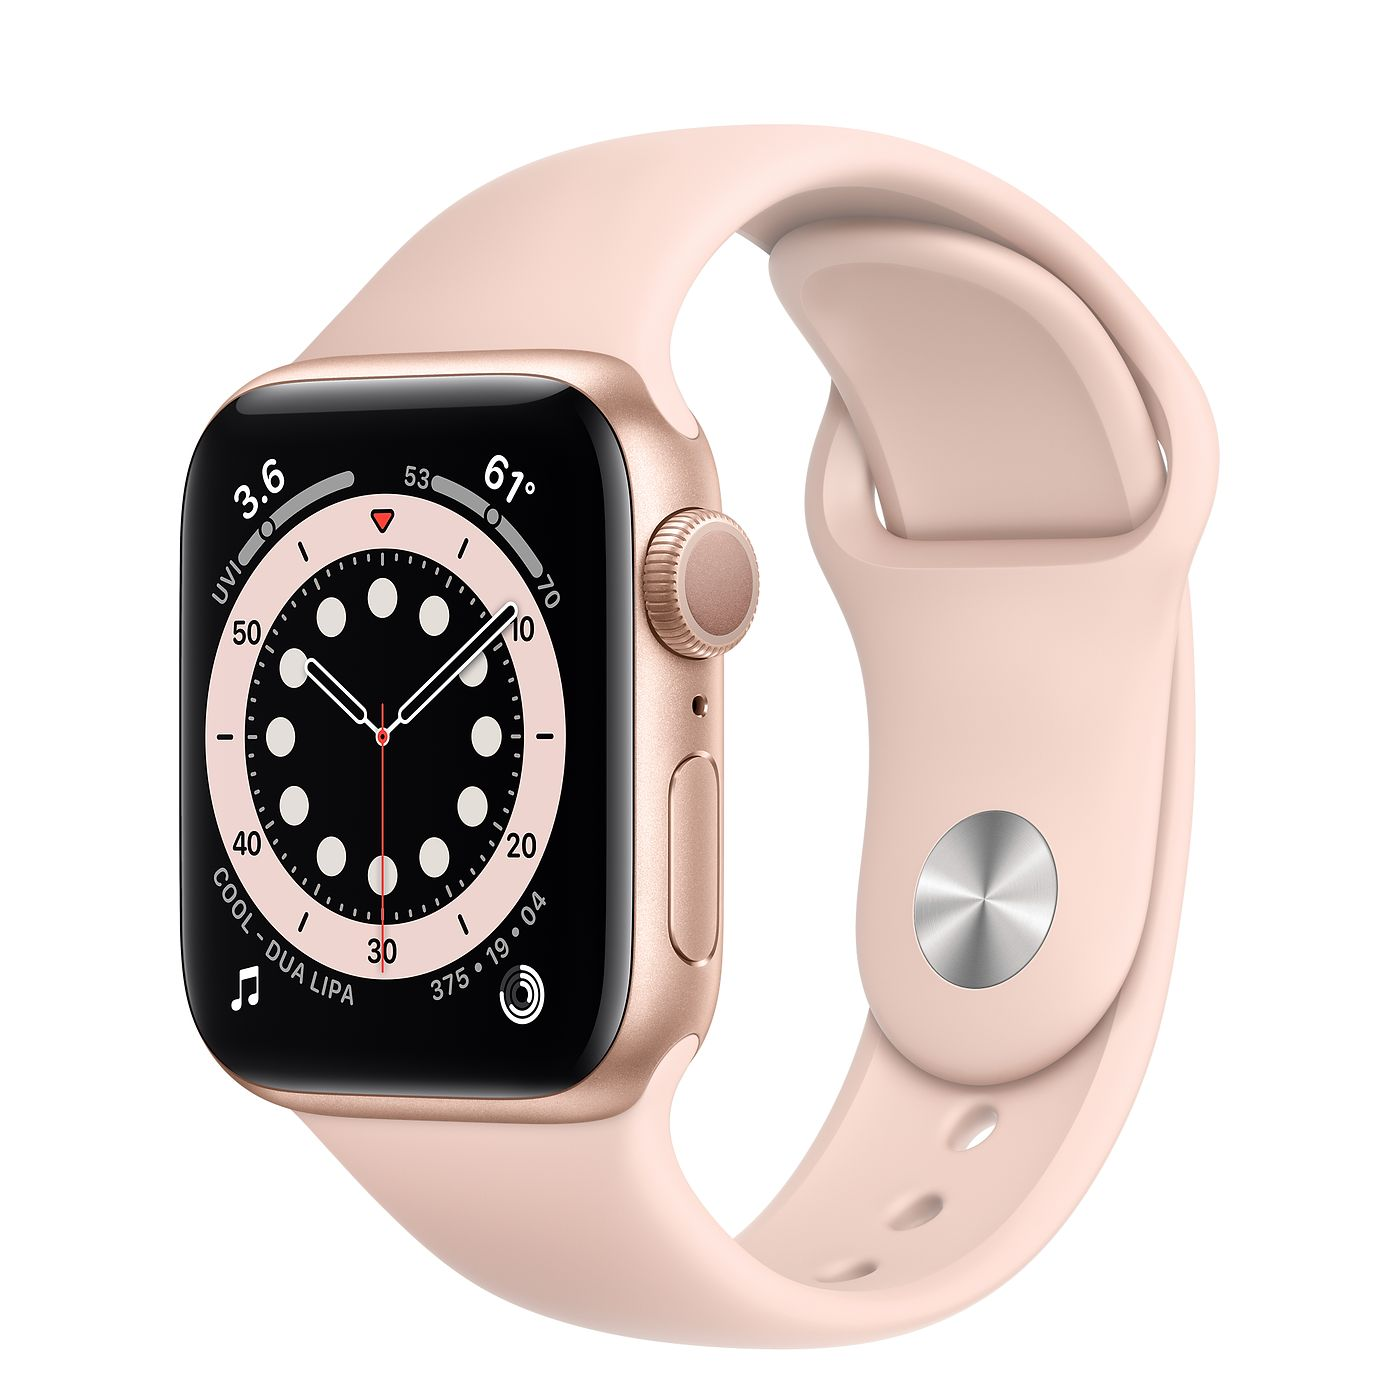 Apple 2020년 애플워치 6, GPS, 골드 알루미늄 케이스, 핑크 샌드 스포츠 밴드